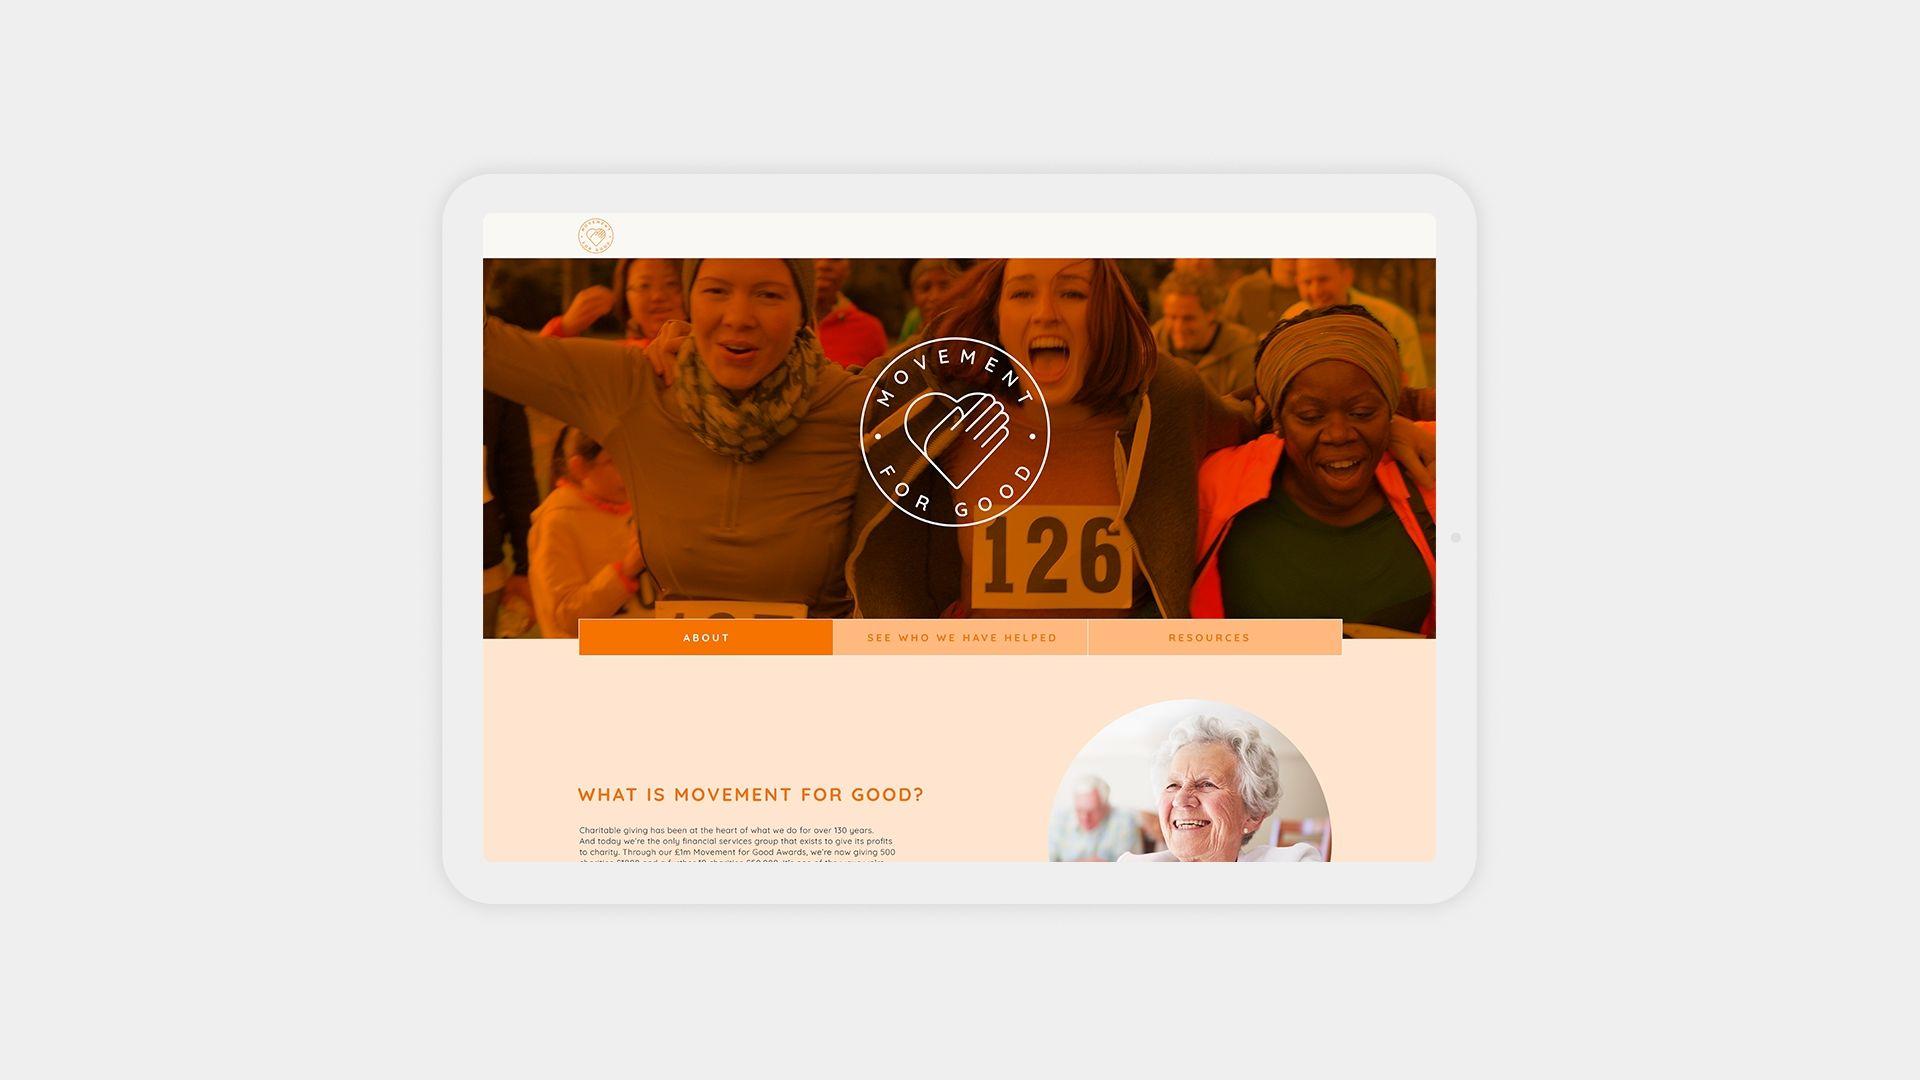 Ecclesiastical Movement For Good Responsive Website Design